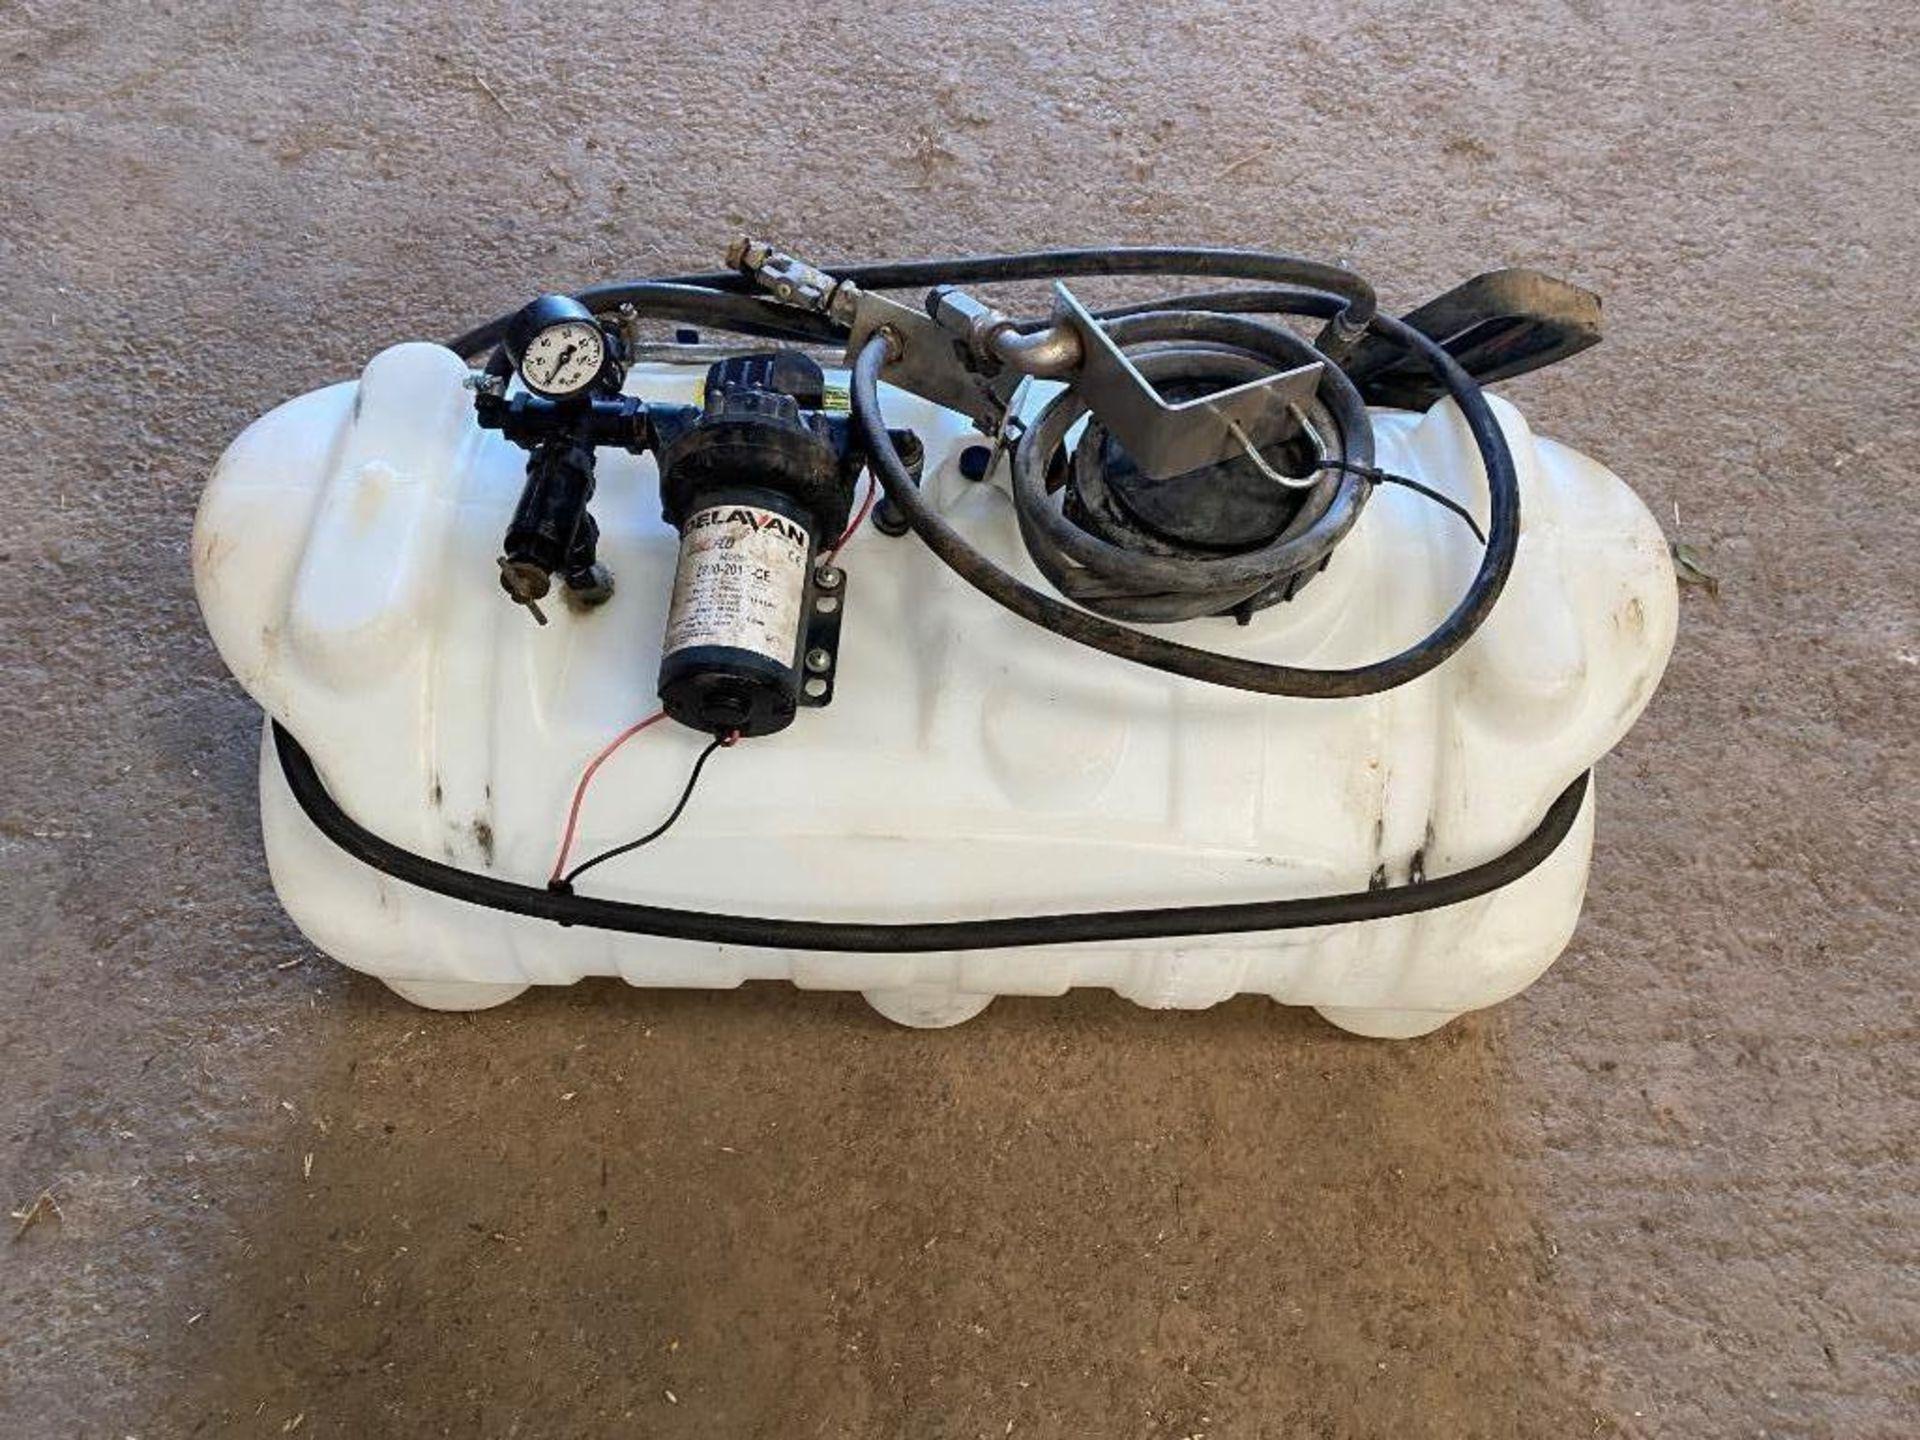 Enduramaxx 90l ATV Sprayer - Image 2 of 4